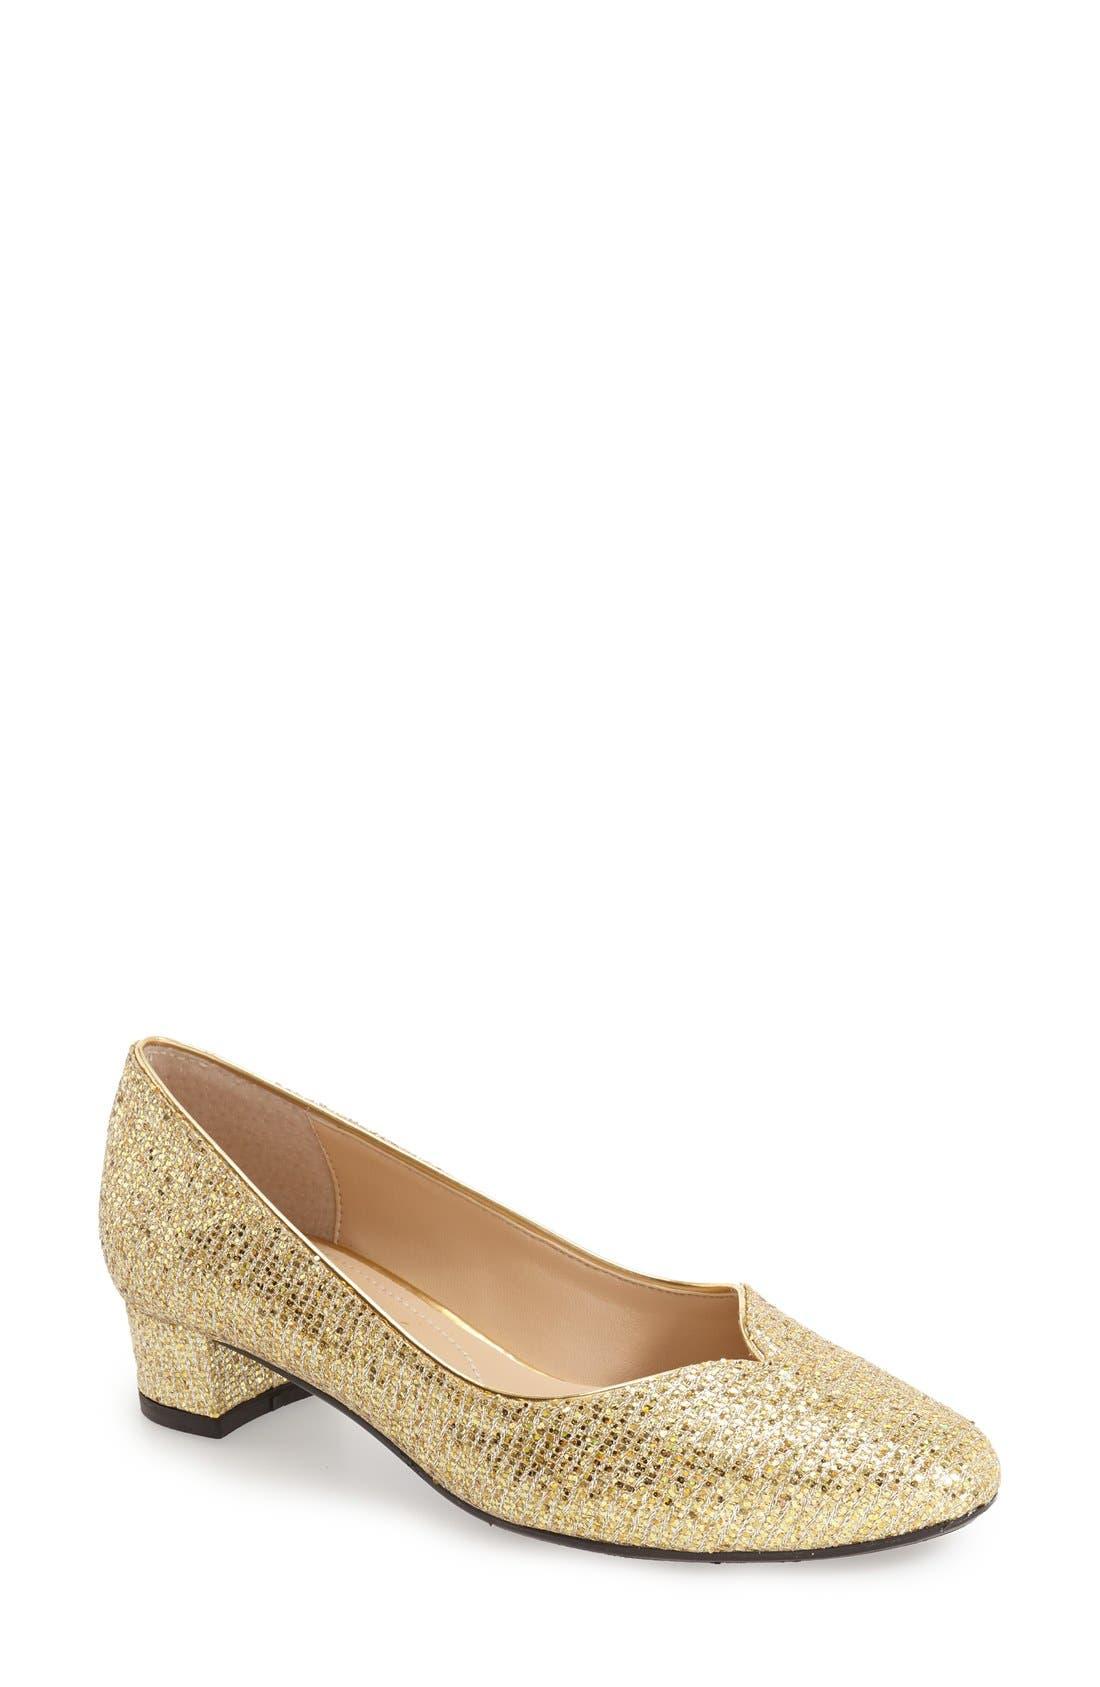 'Bambalina' Block Heel Glitter Pump,                         Main,                         color, Gold Glitter Fabric